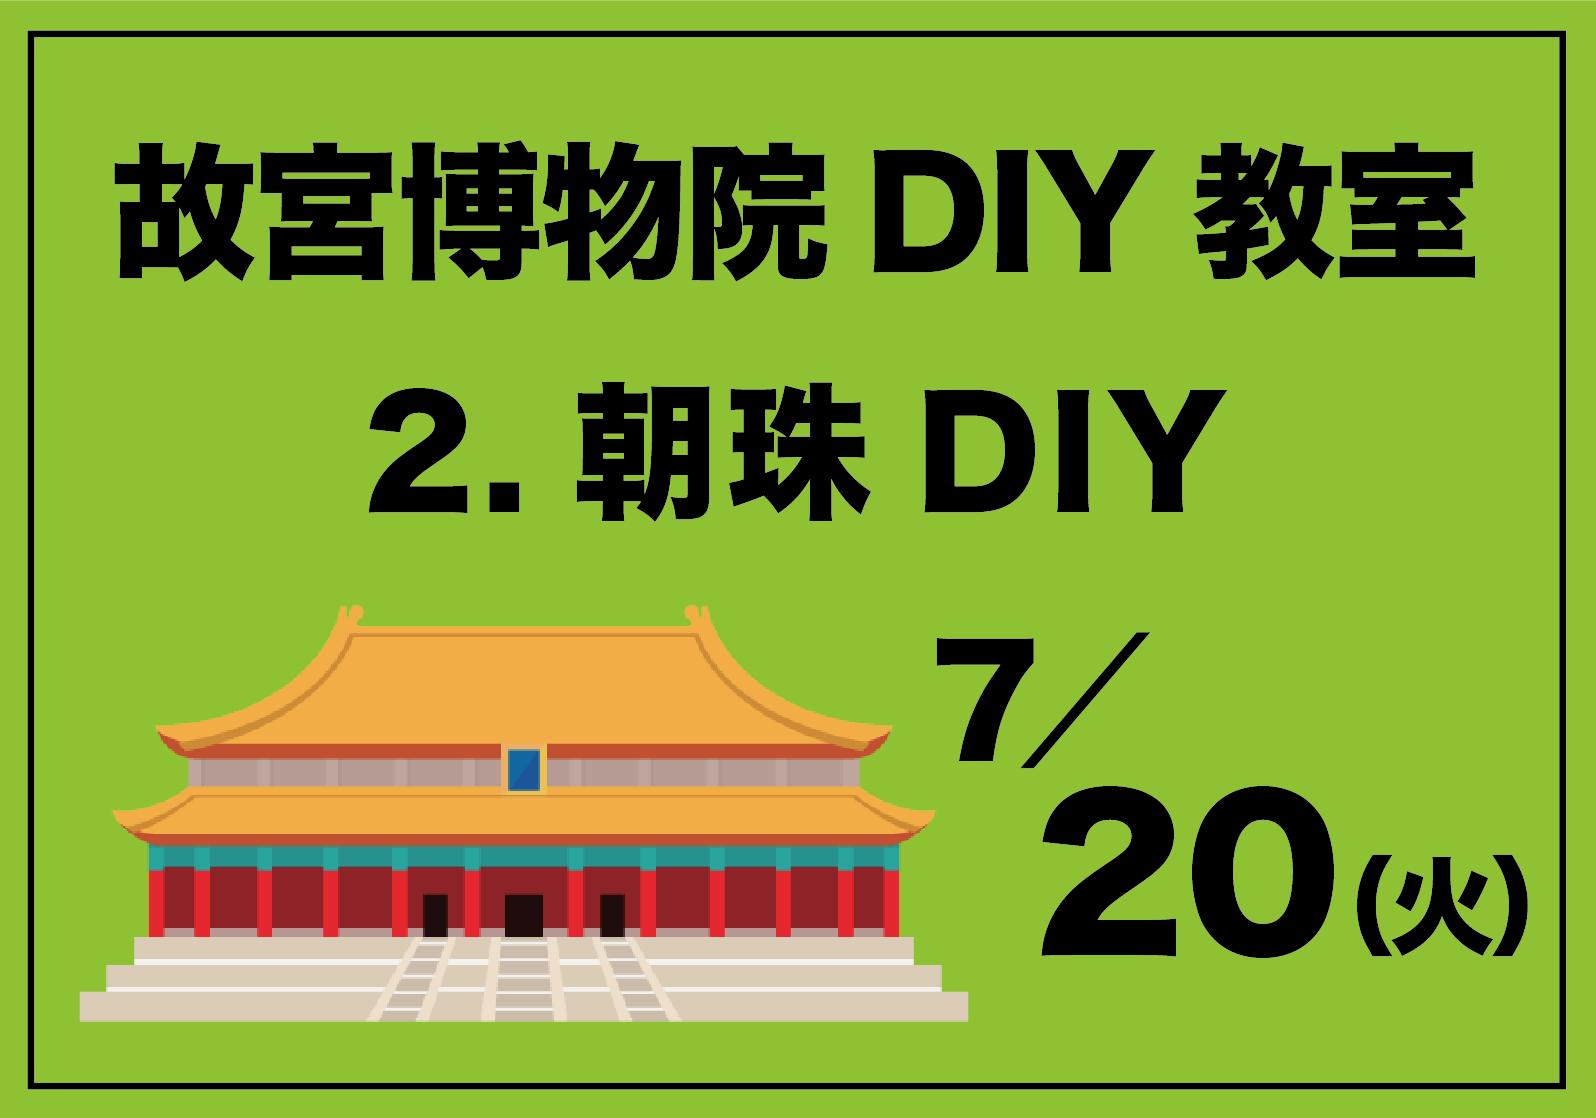 故宮博物院DIY教室「2.朝珠DIY」7月20日